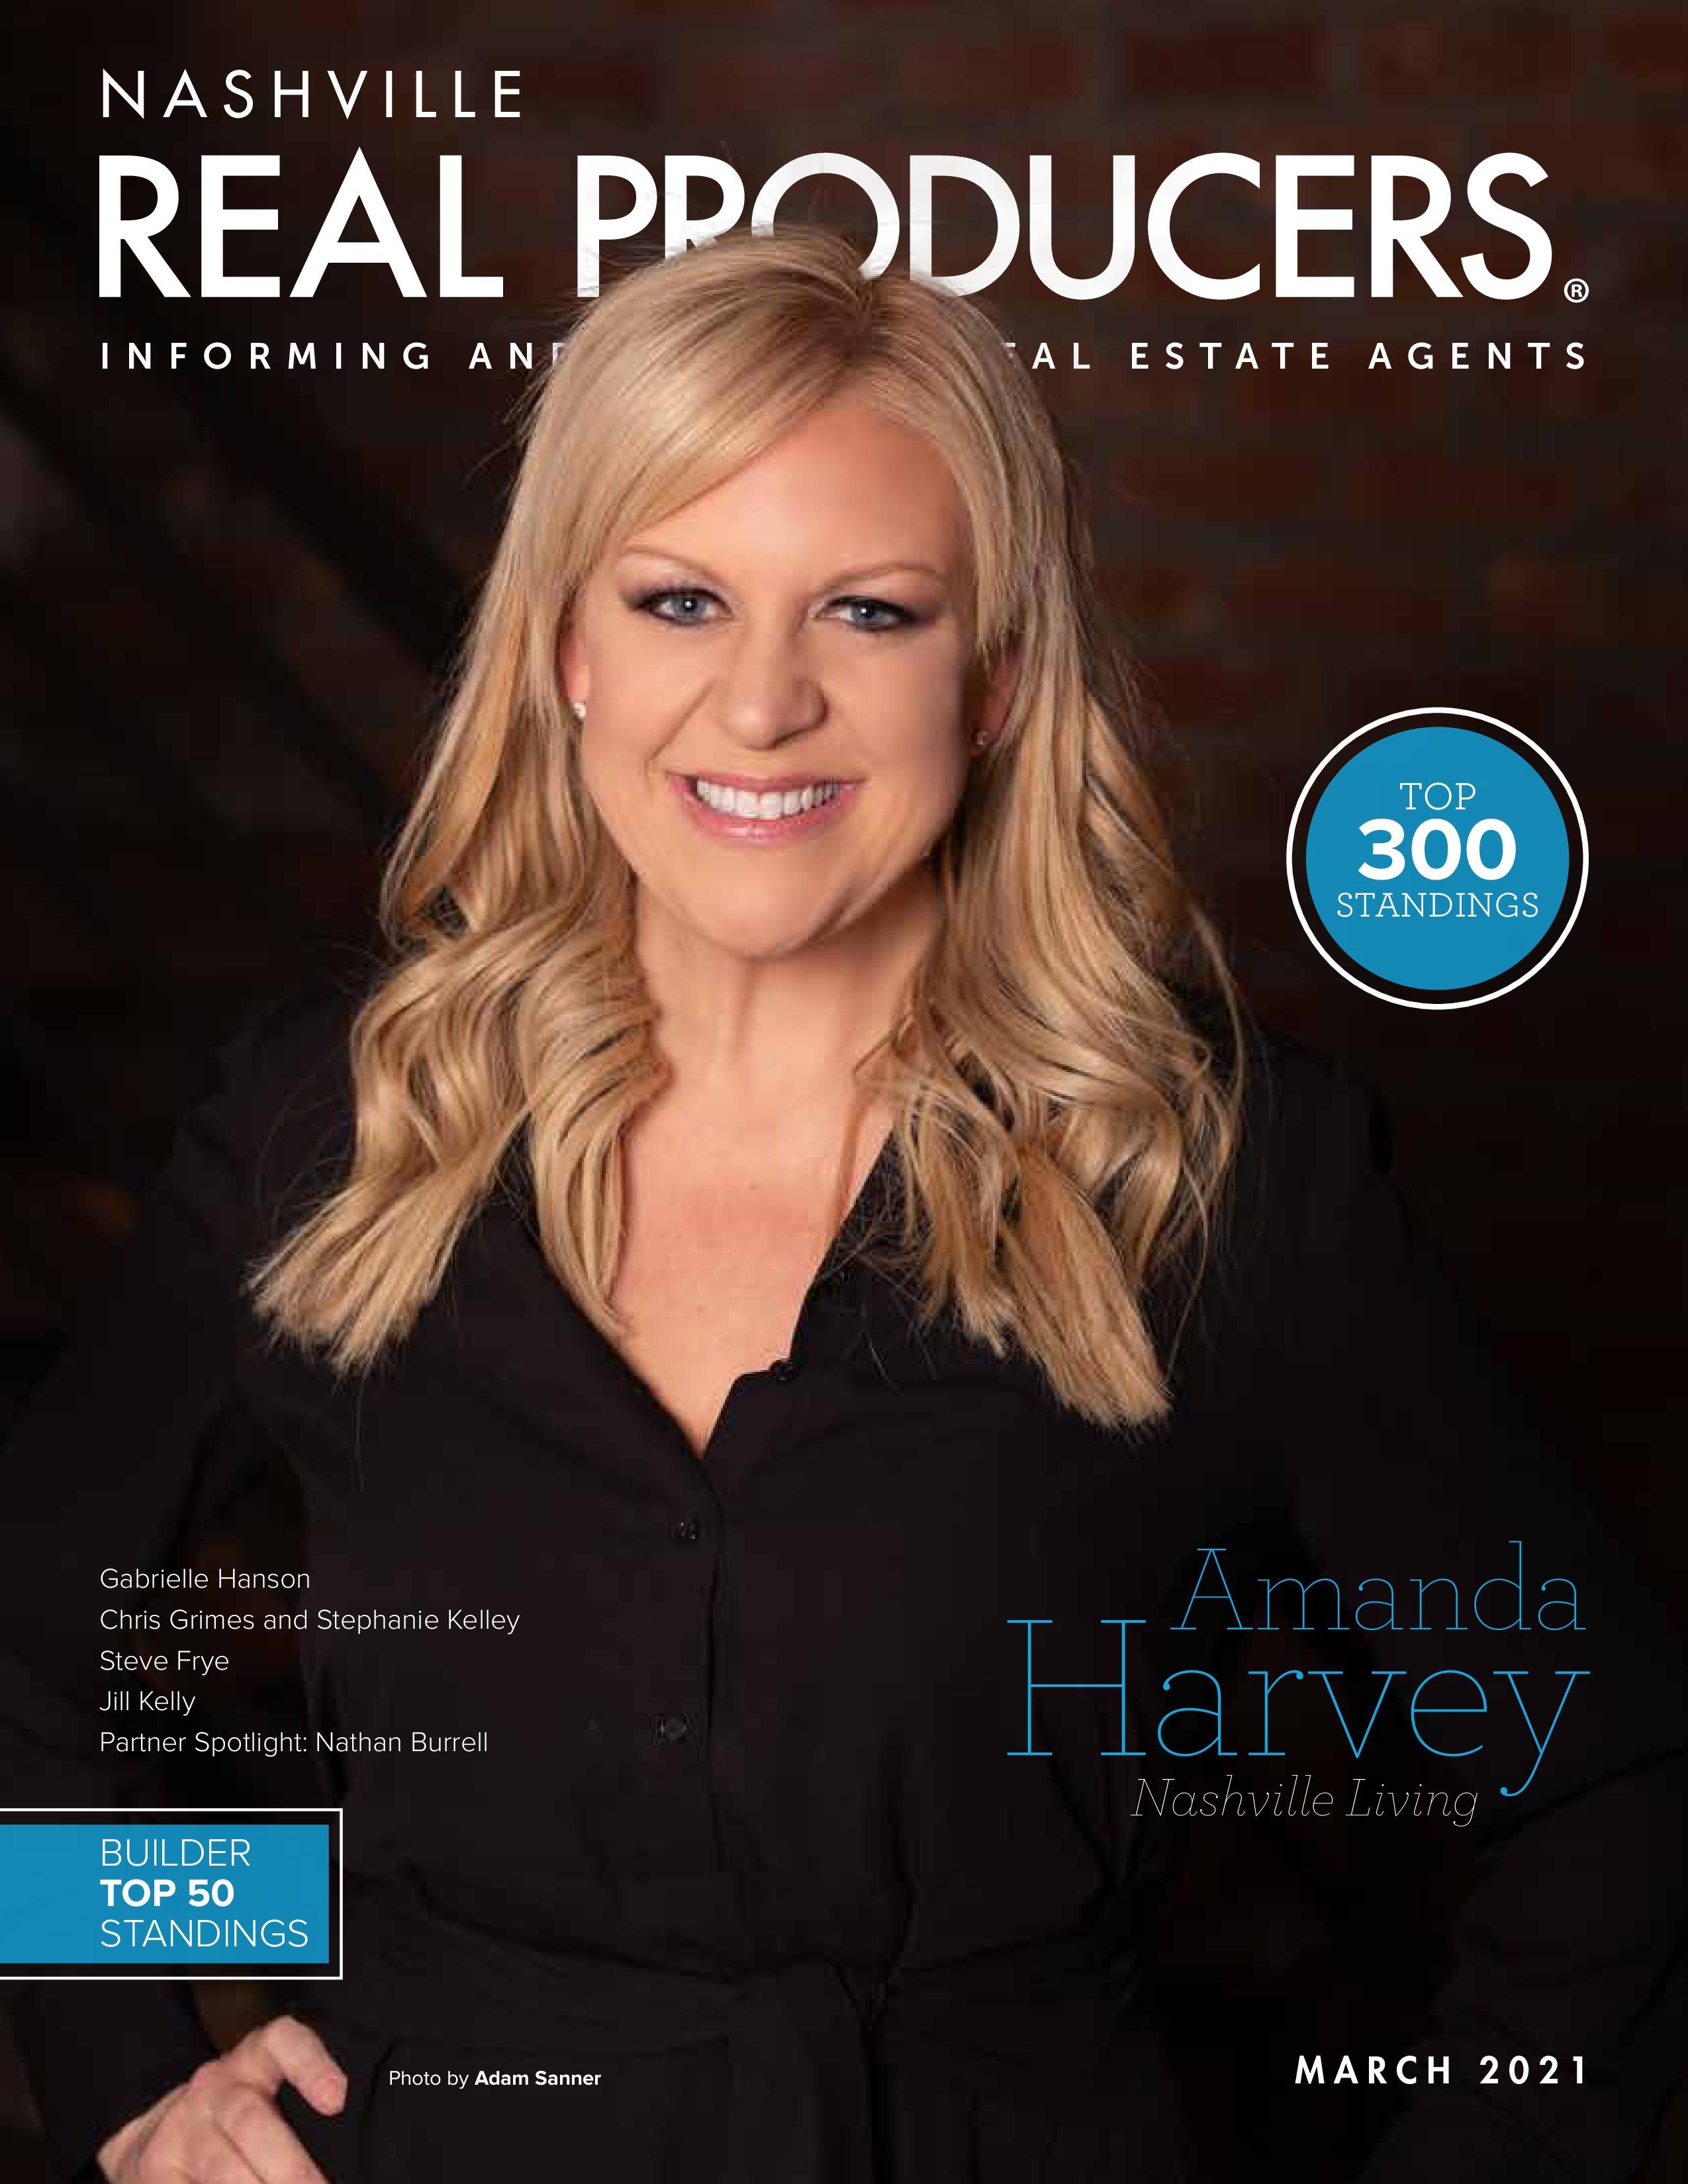 Nashville Real Producers 2021-03-01